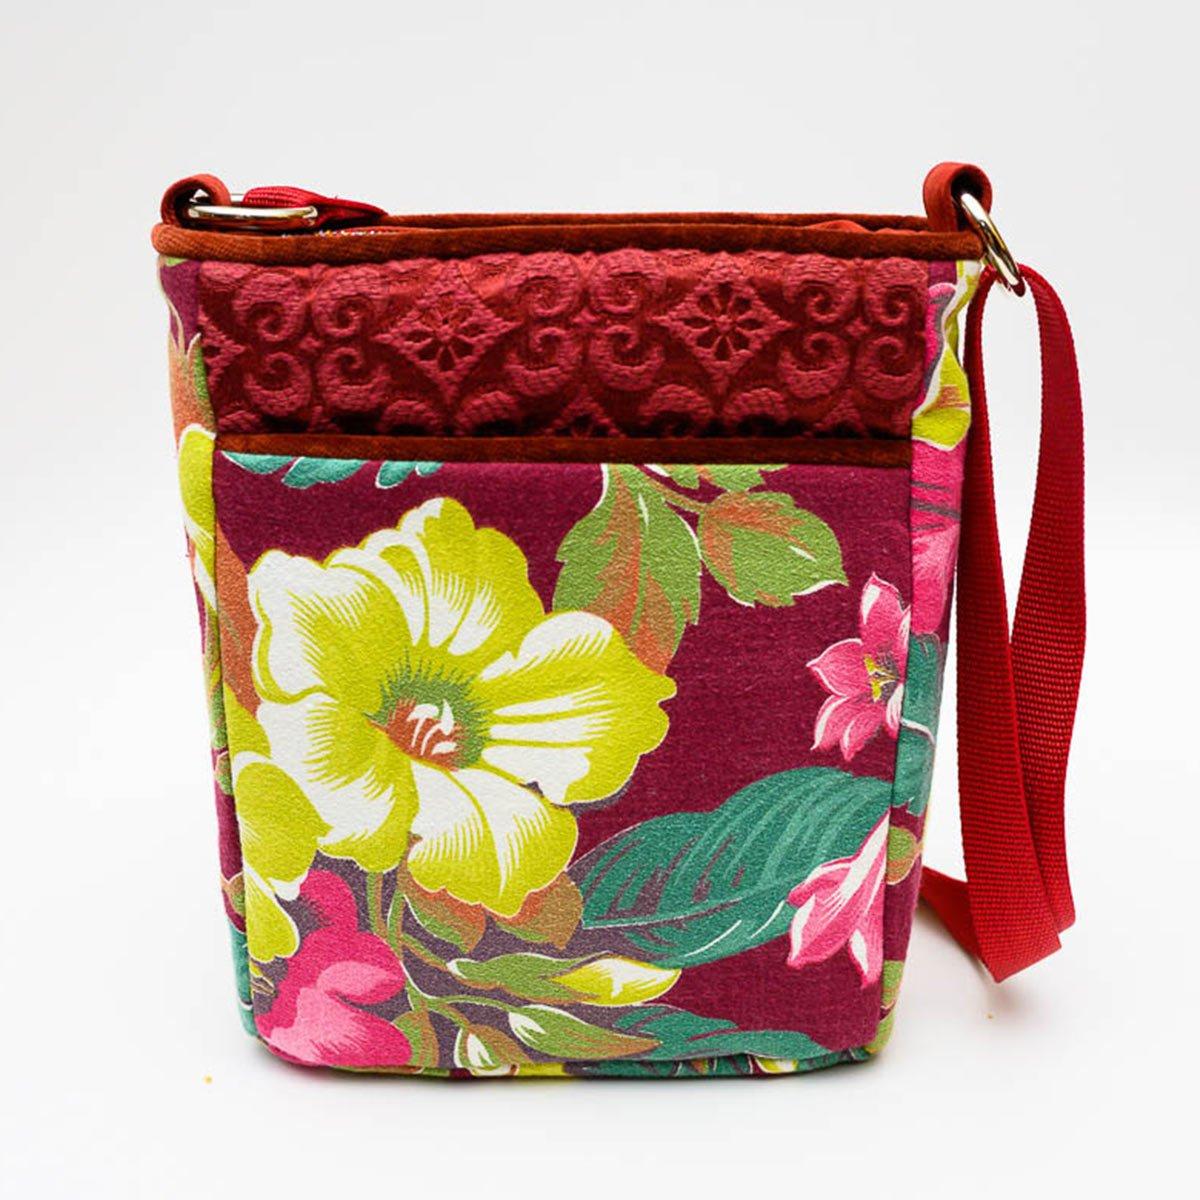 crossbody_bag_hibiscus_motif_on_magenta-MLP_6198